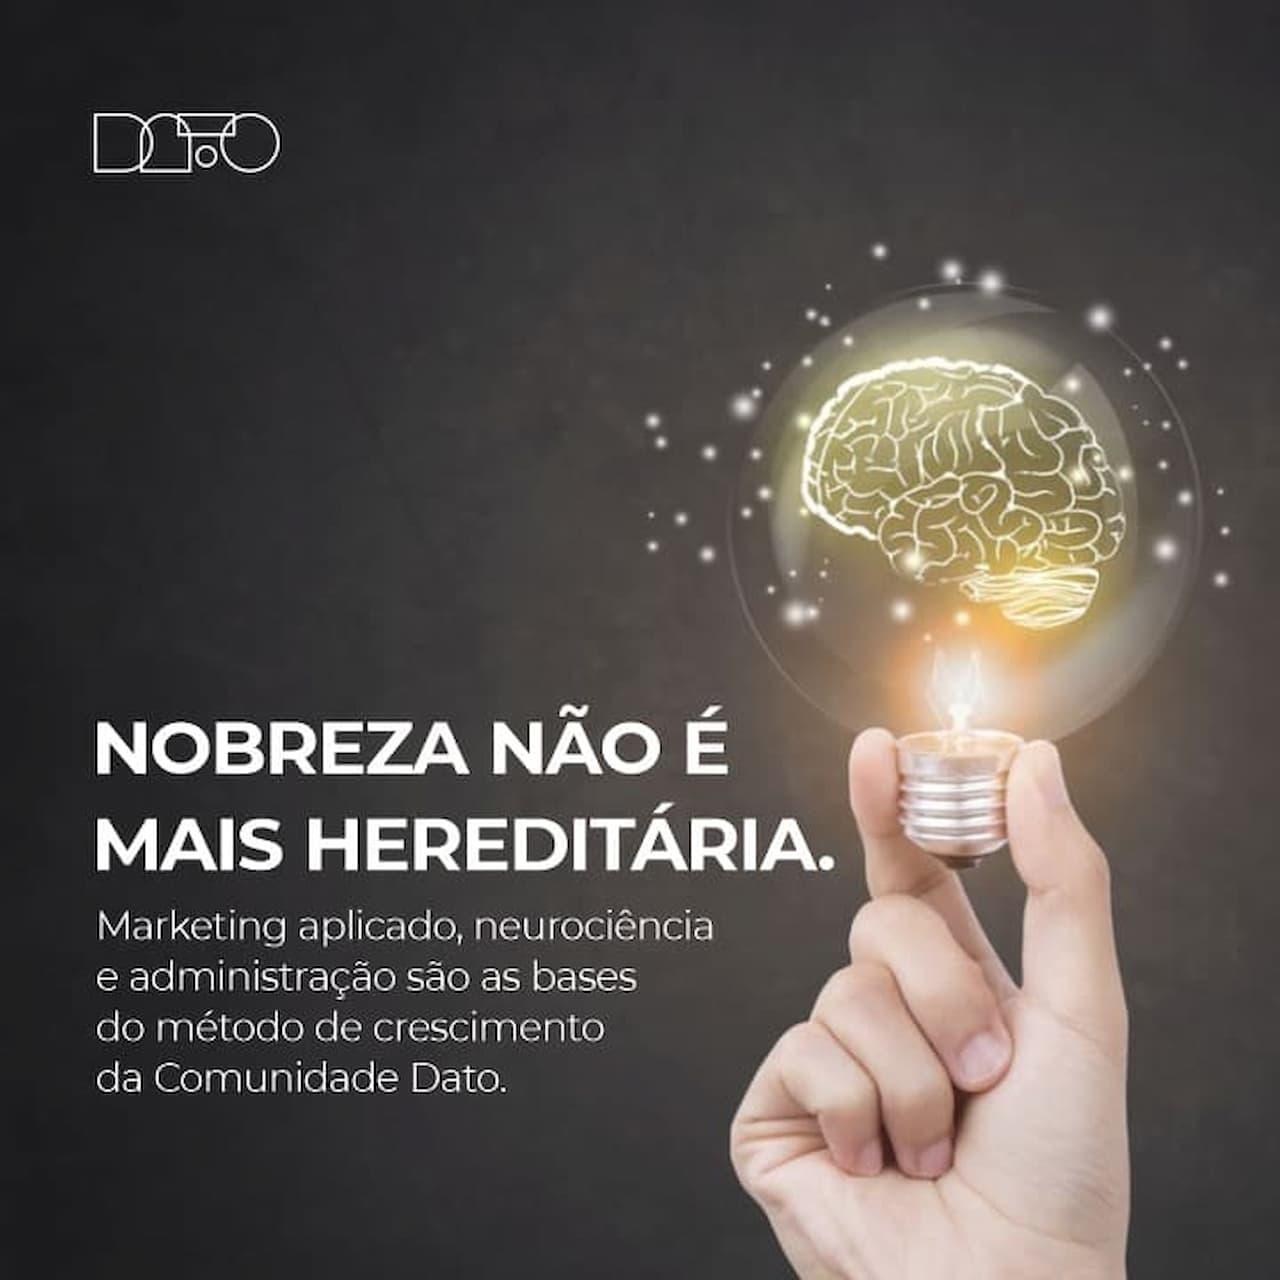 Nasce na Capital Federal a Comunidade Dato, método que vai revolucionar a forma de fazer marketing